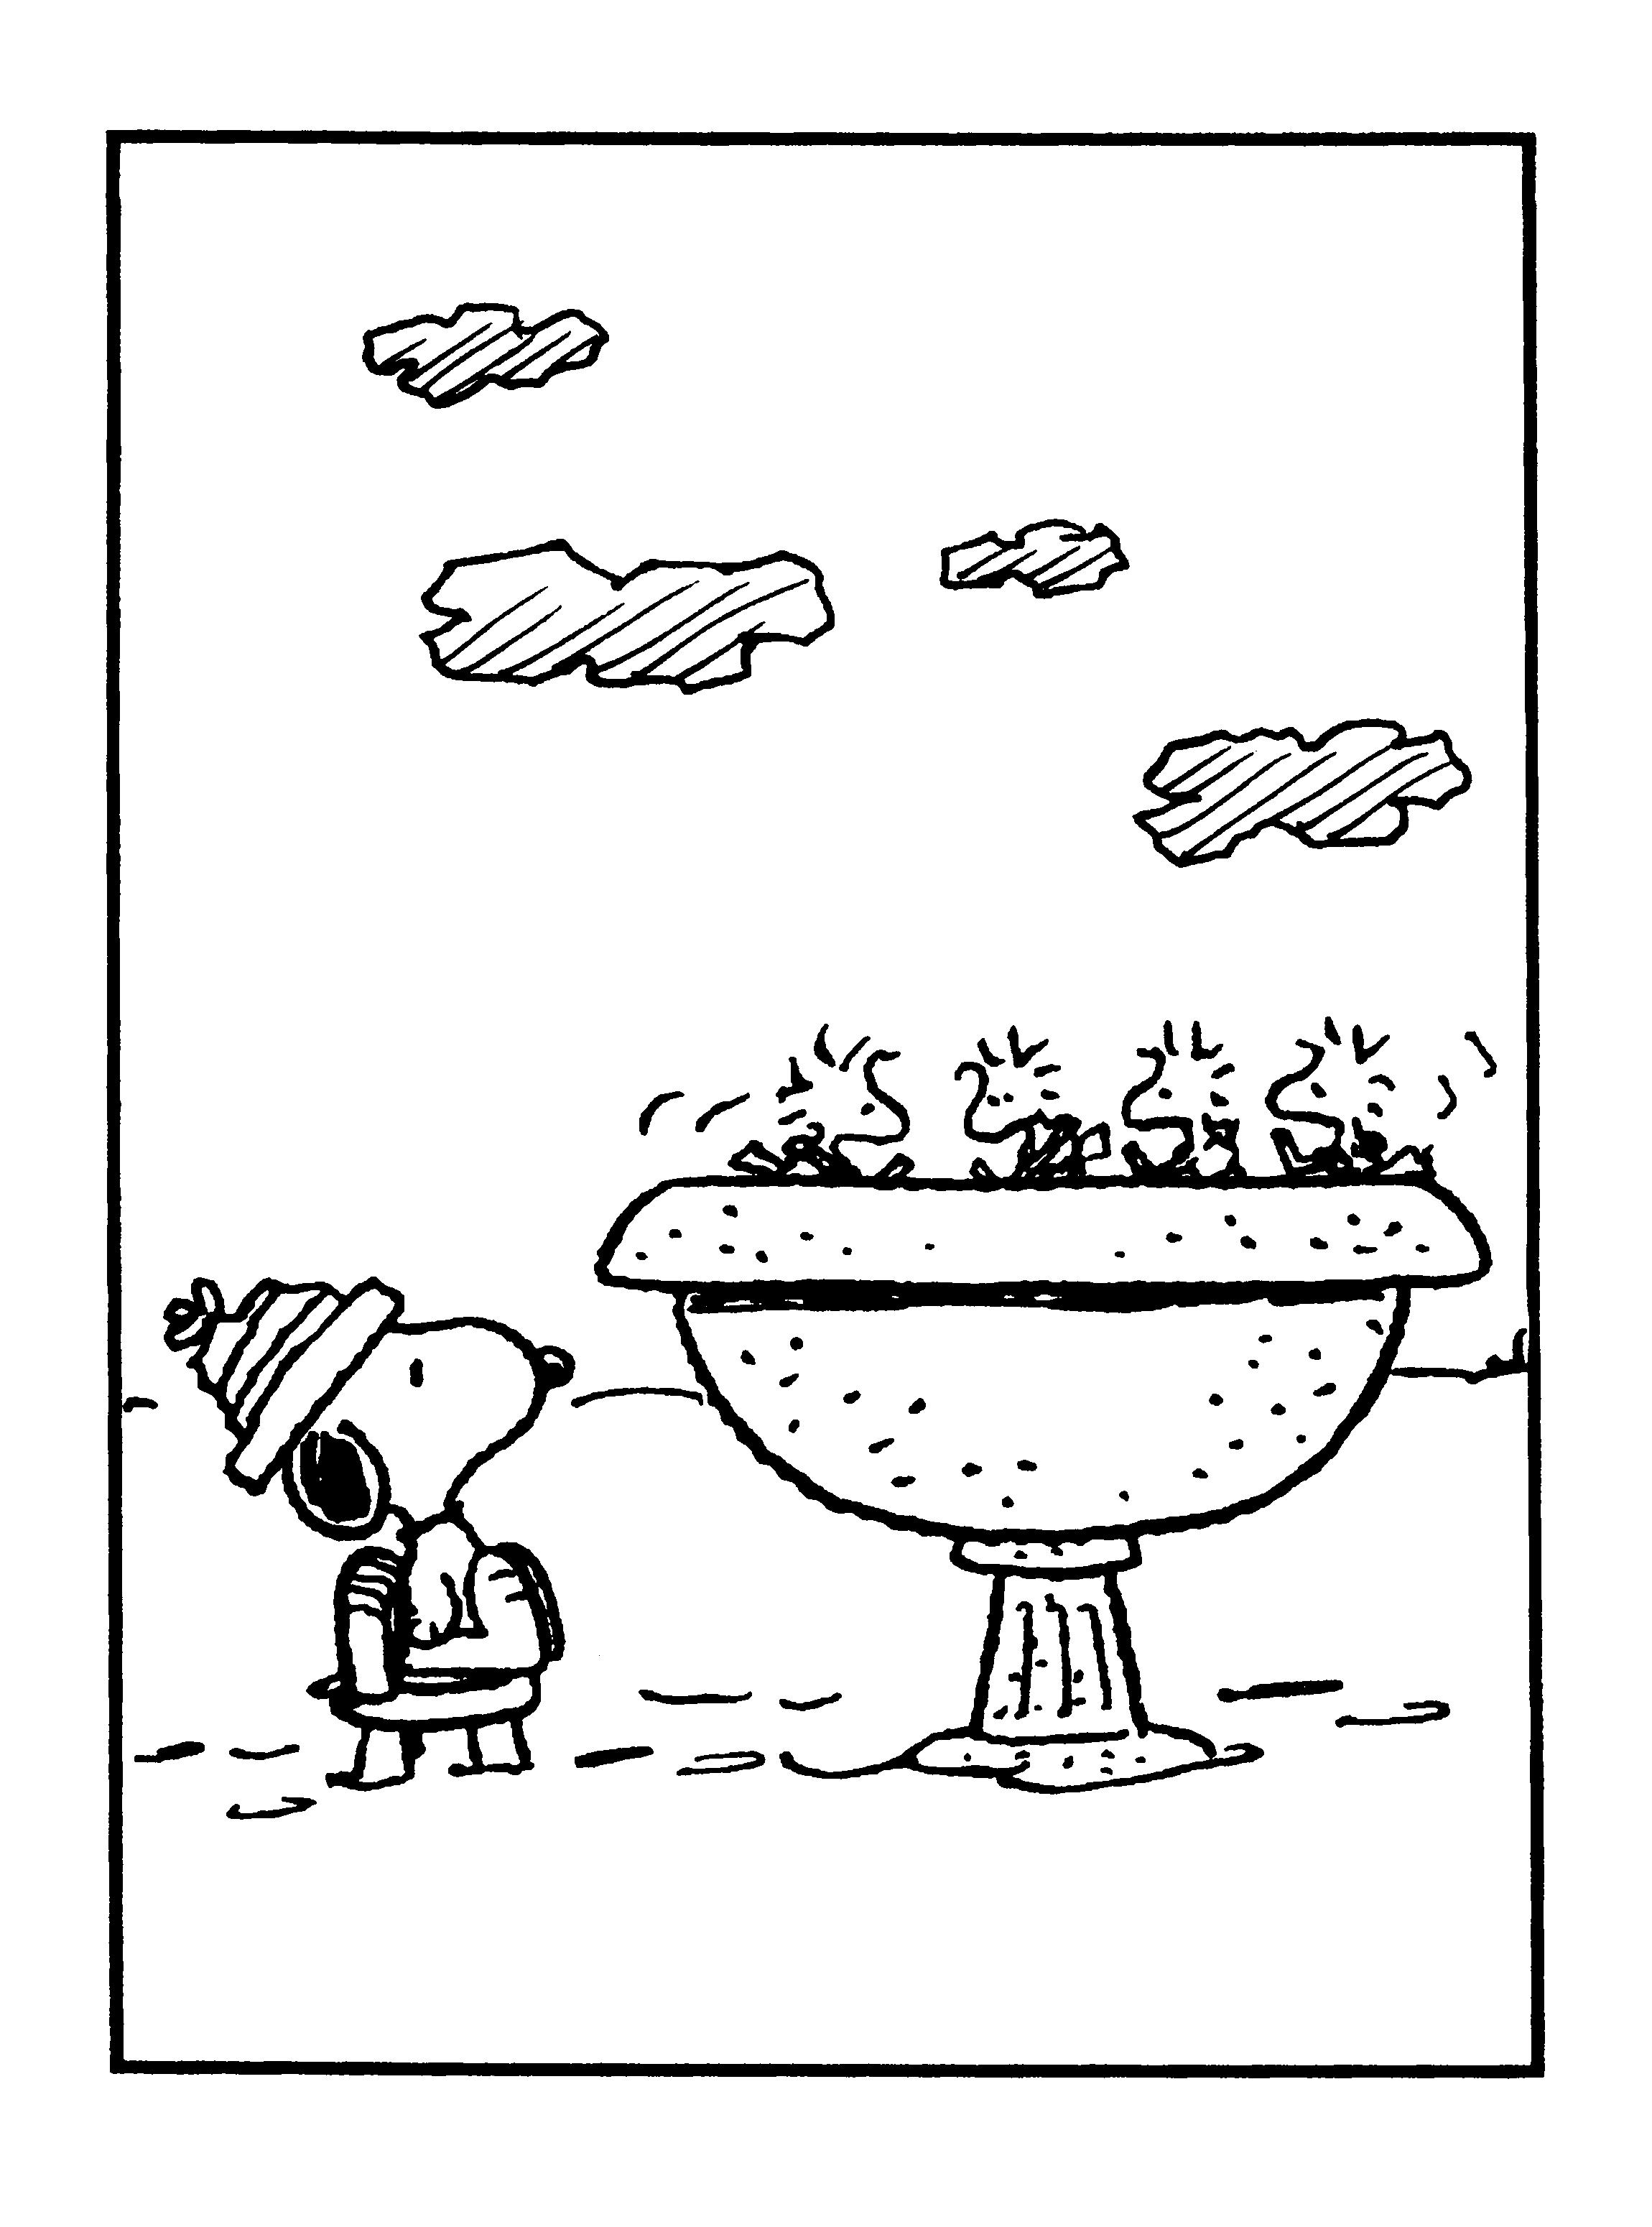 peanuts comics coloring pages - photo#47